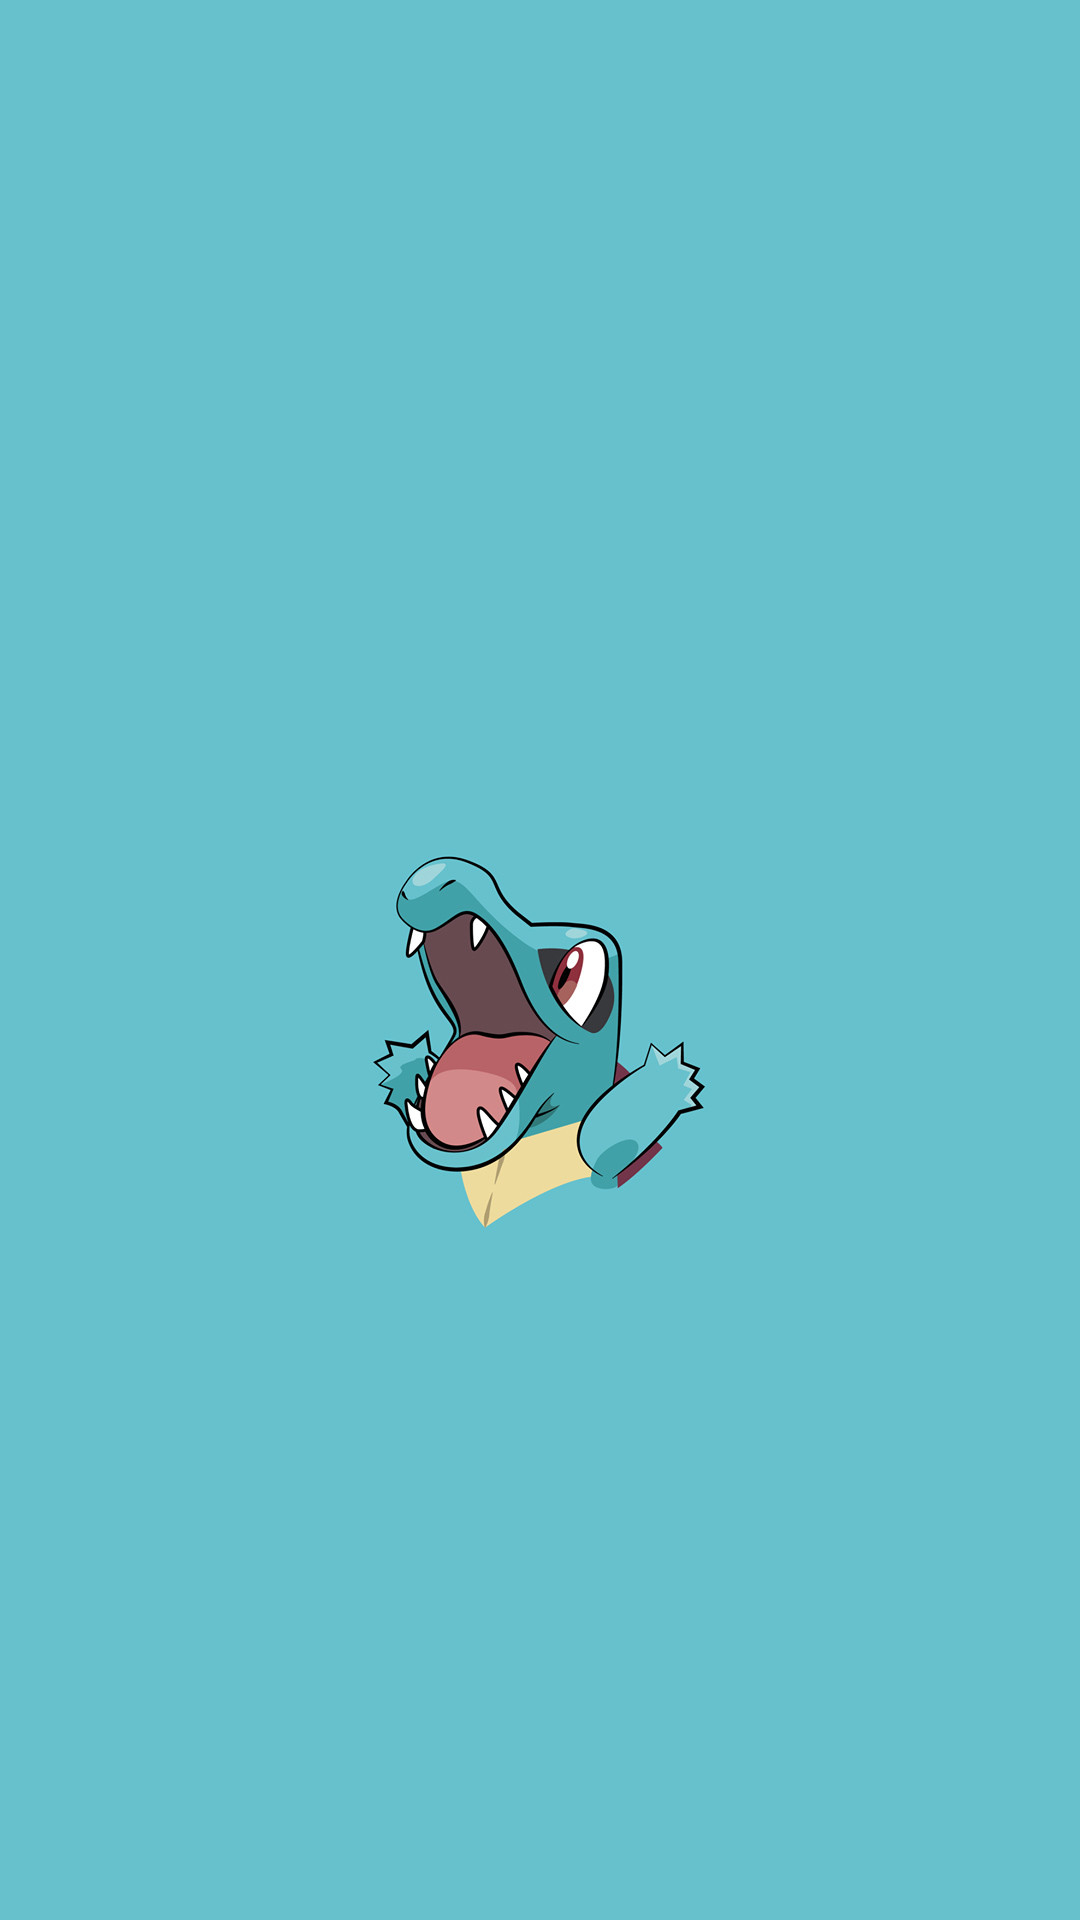 Totodile Pokemon iPhone 6+ HD Wallpaper – https://freebestpicture.com/